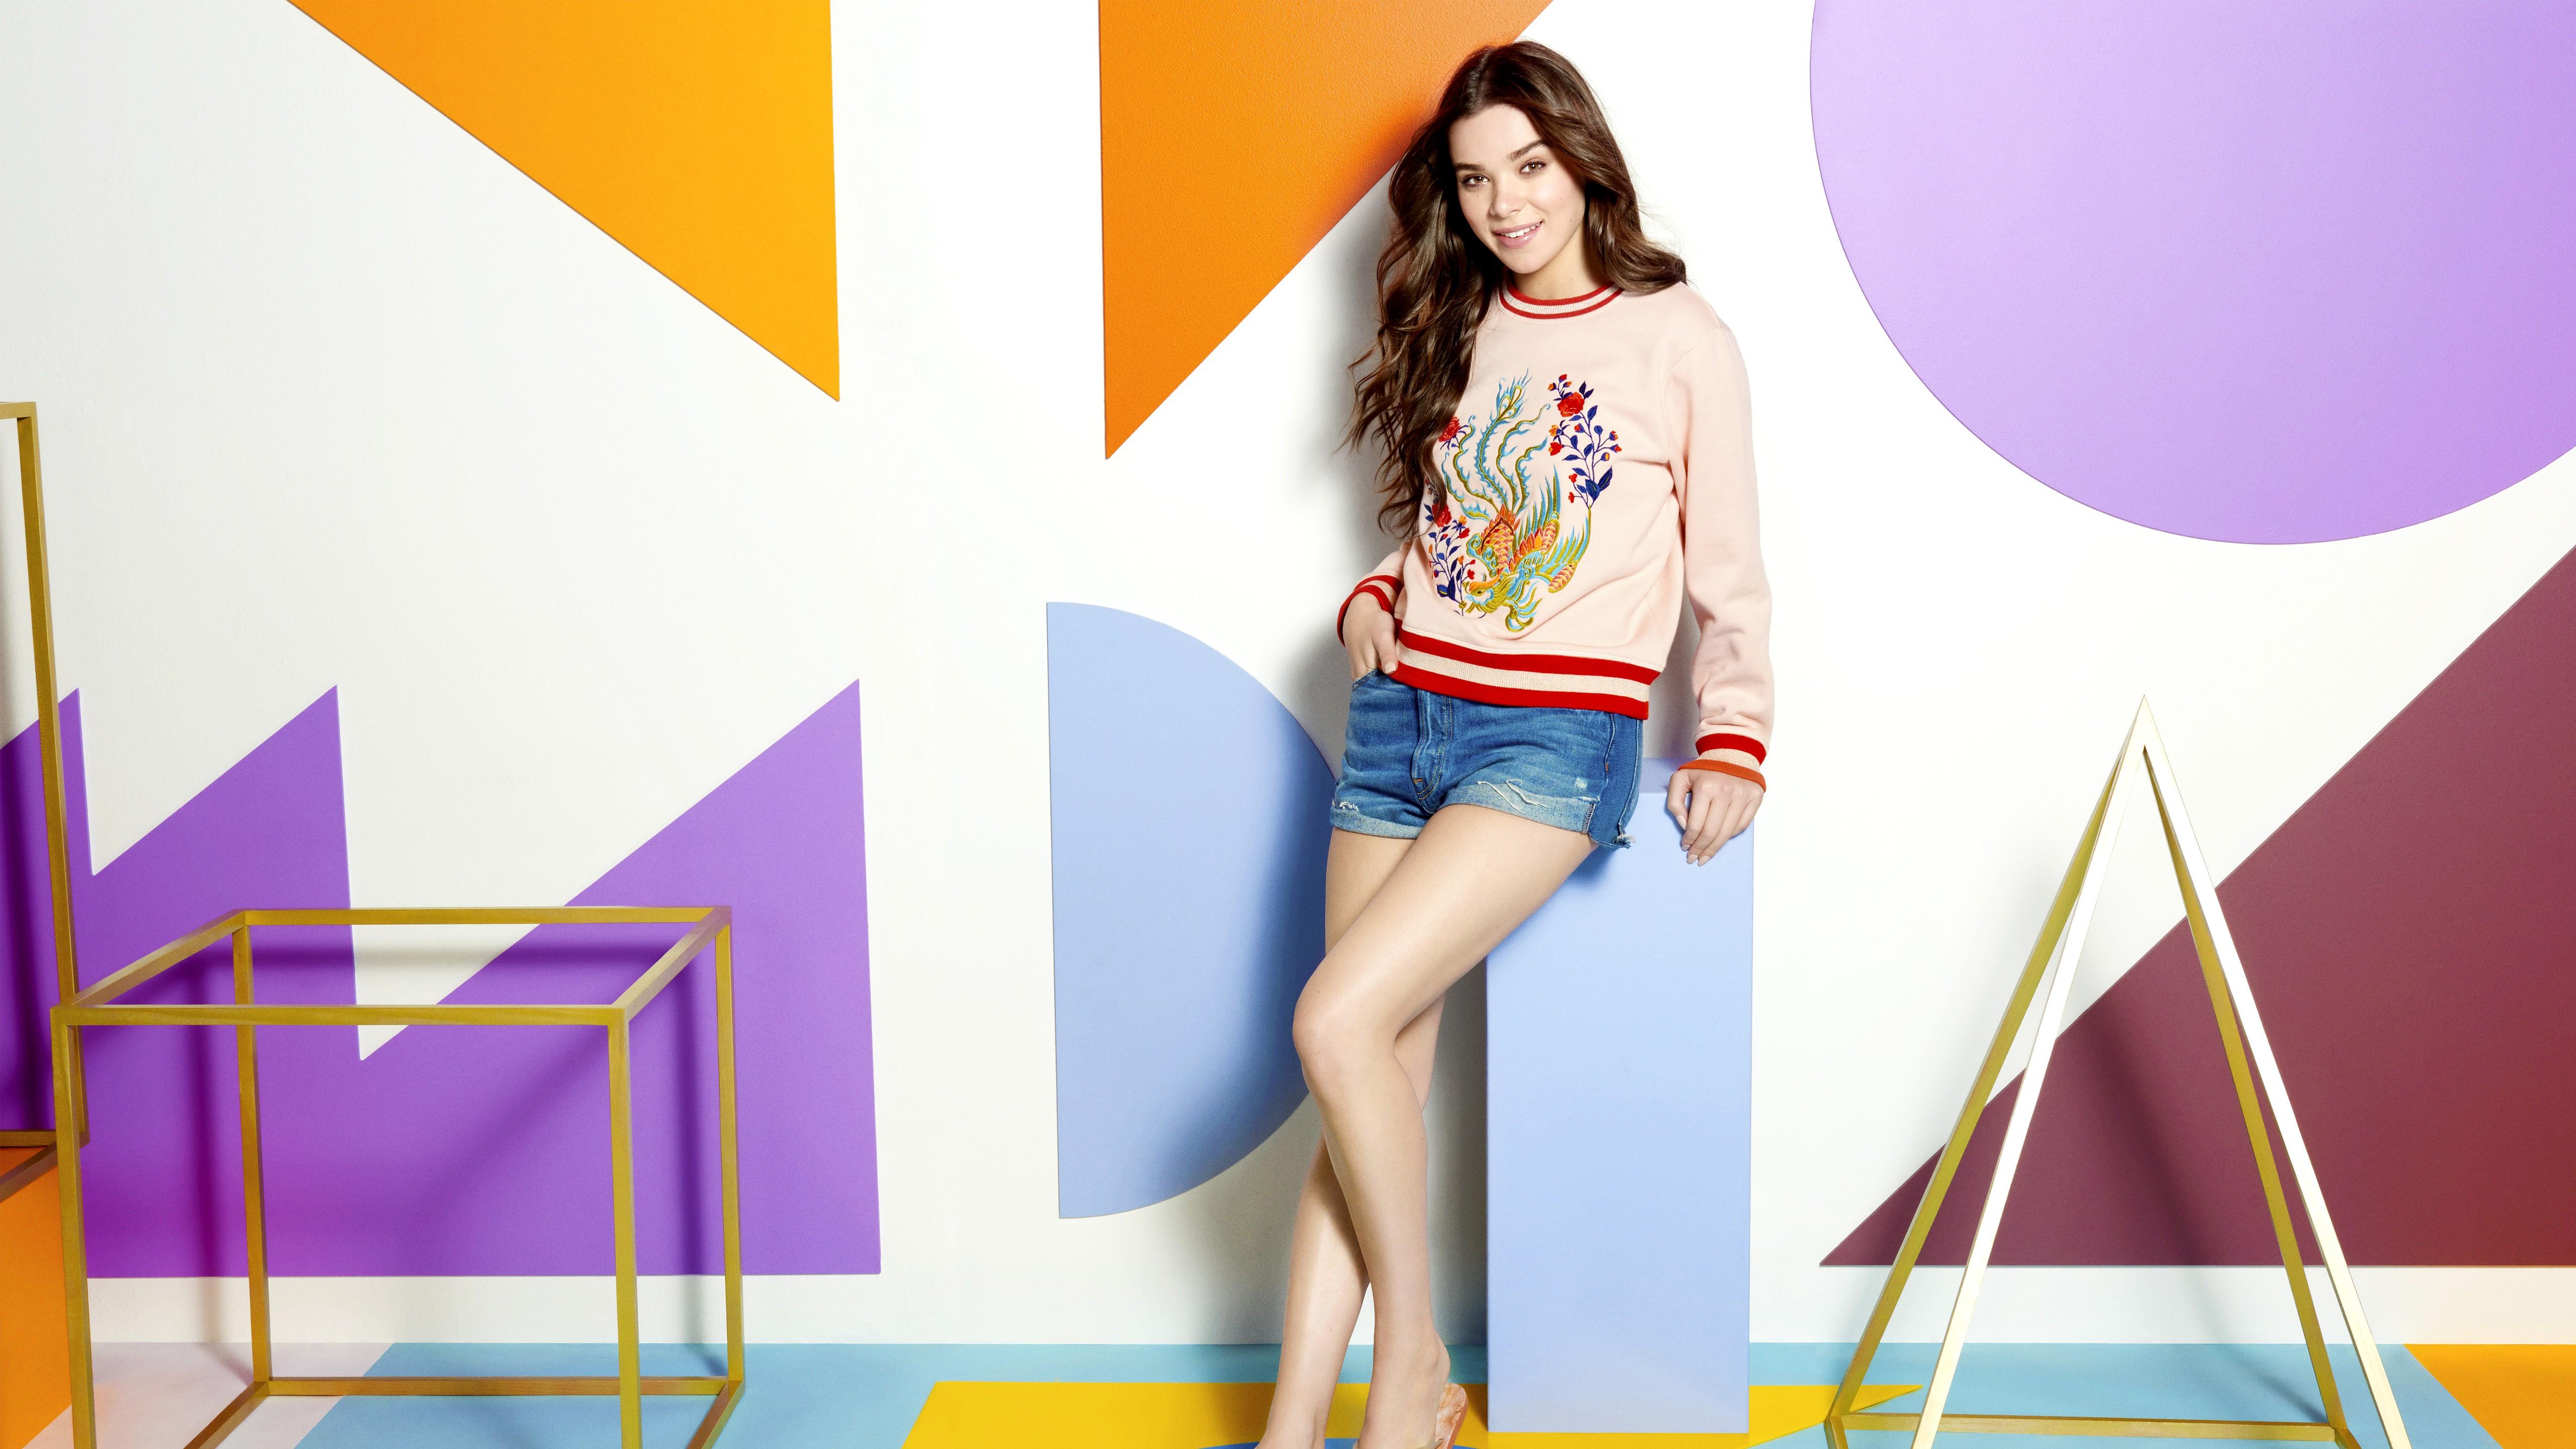 Selena Gomez Wallpaper Iphone 7 Plus Hailee Steinfeld 5k Hd Wallpapers Hd Wallpapers Id 20707